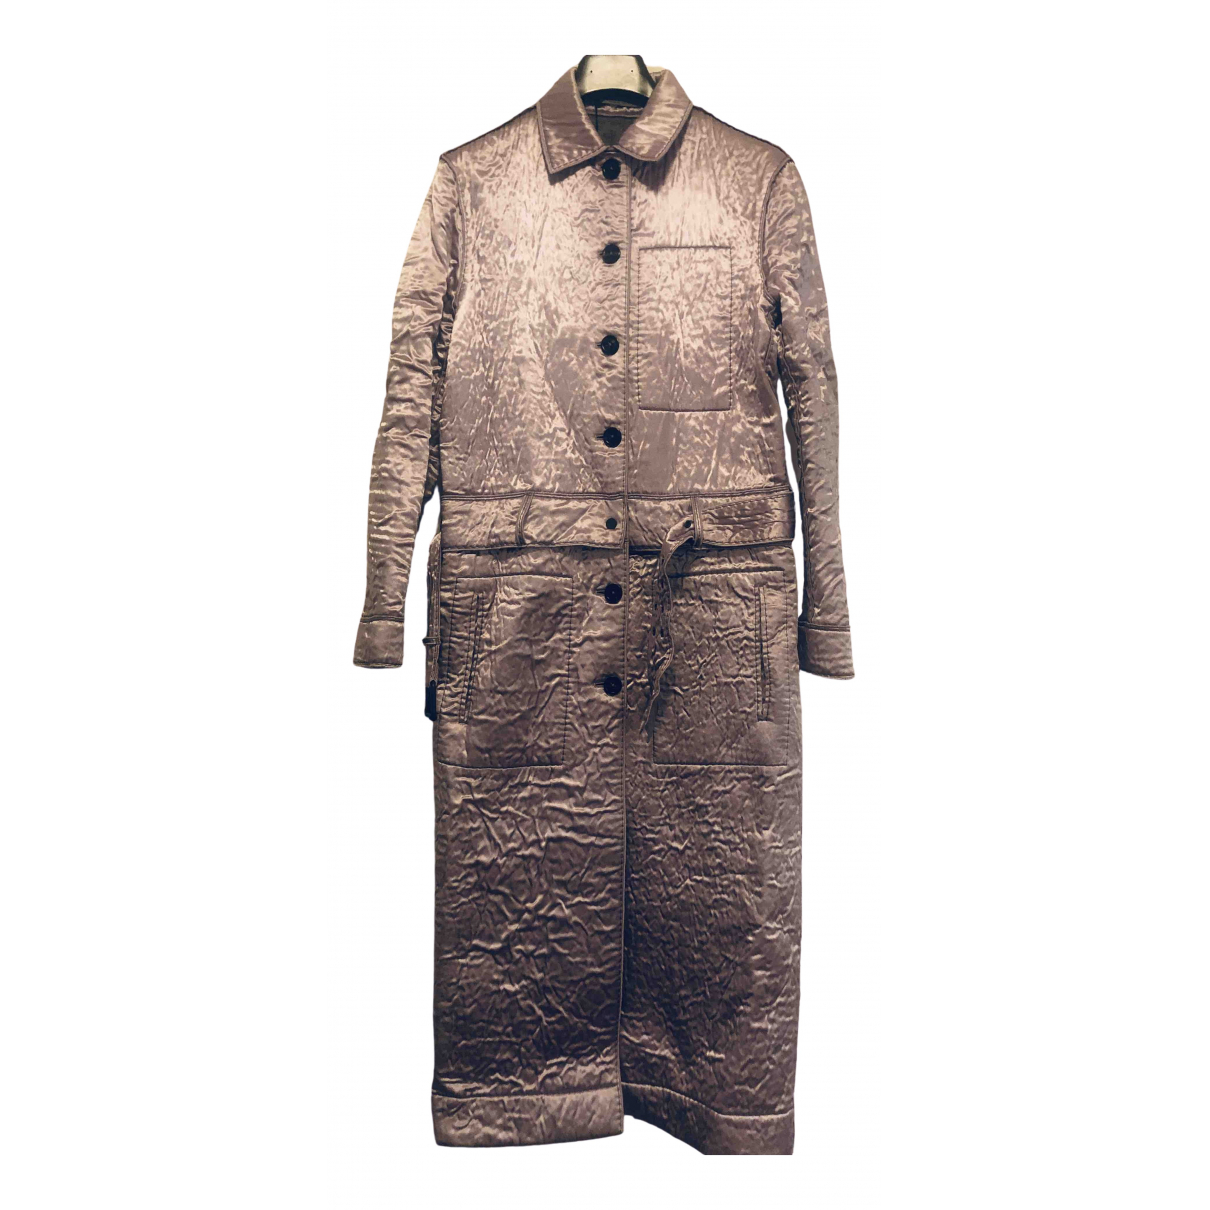 Bottega Veneta - Manteau   pour femme en laine - metallise